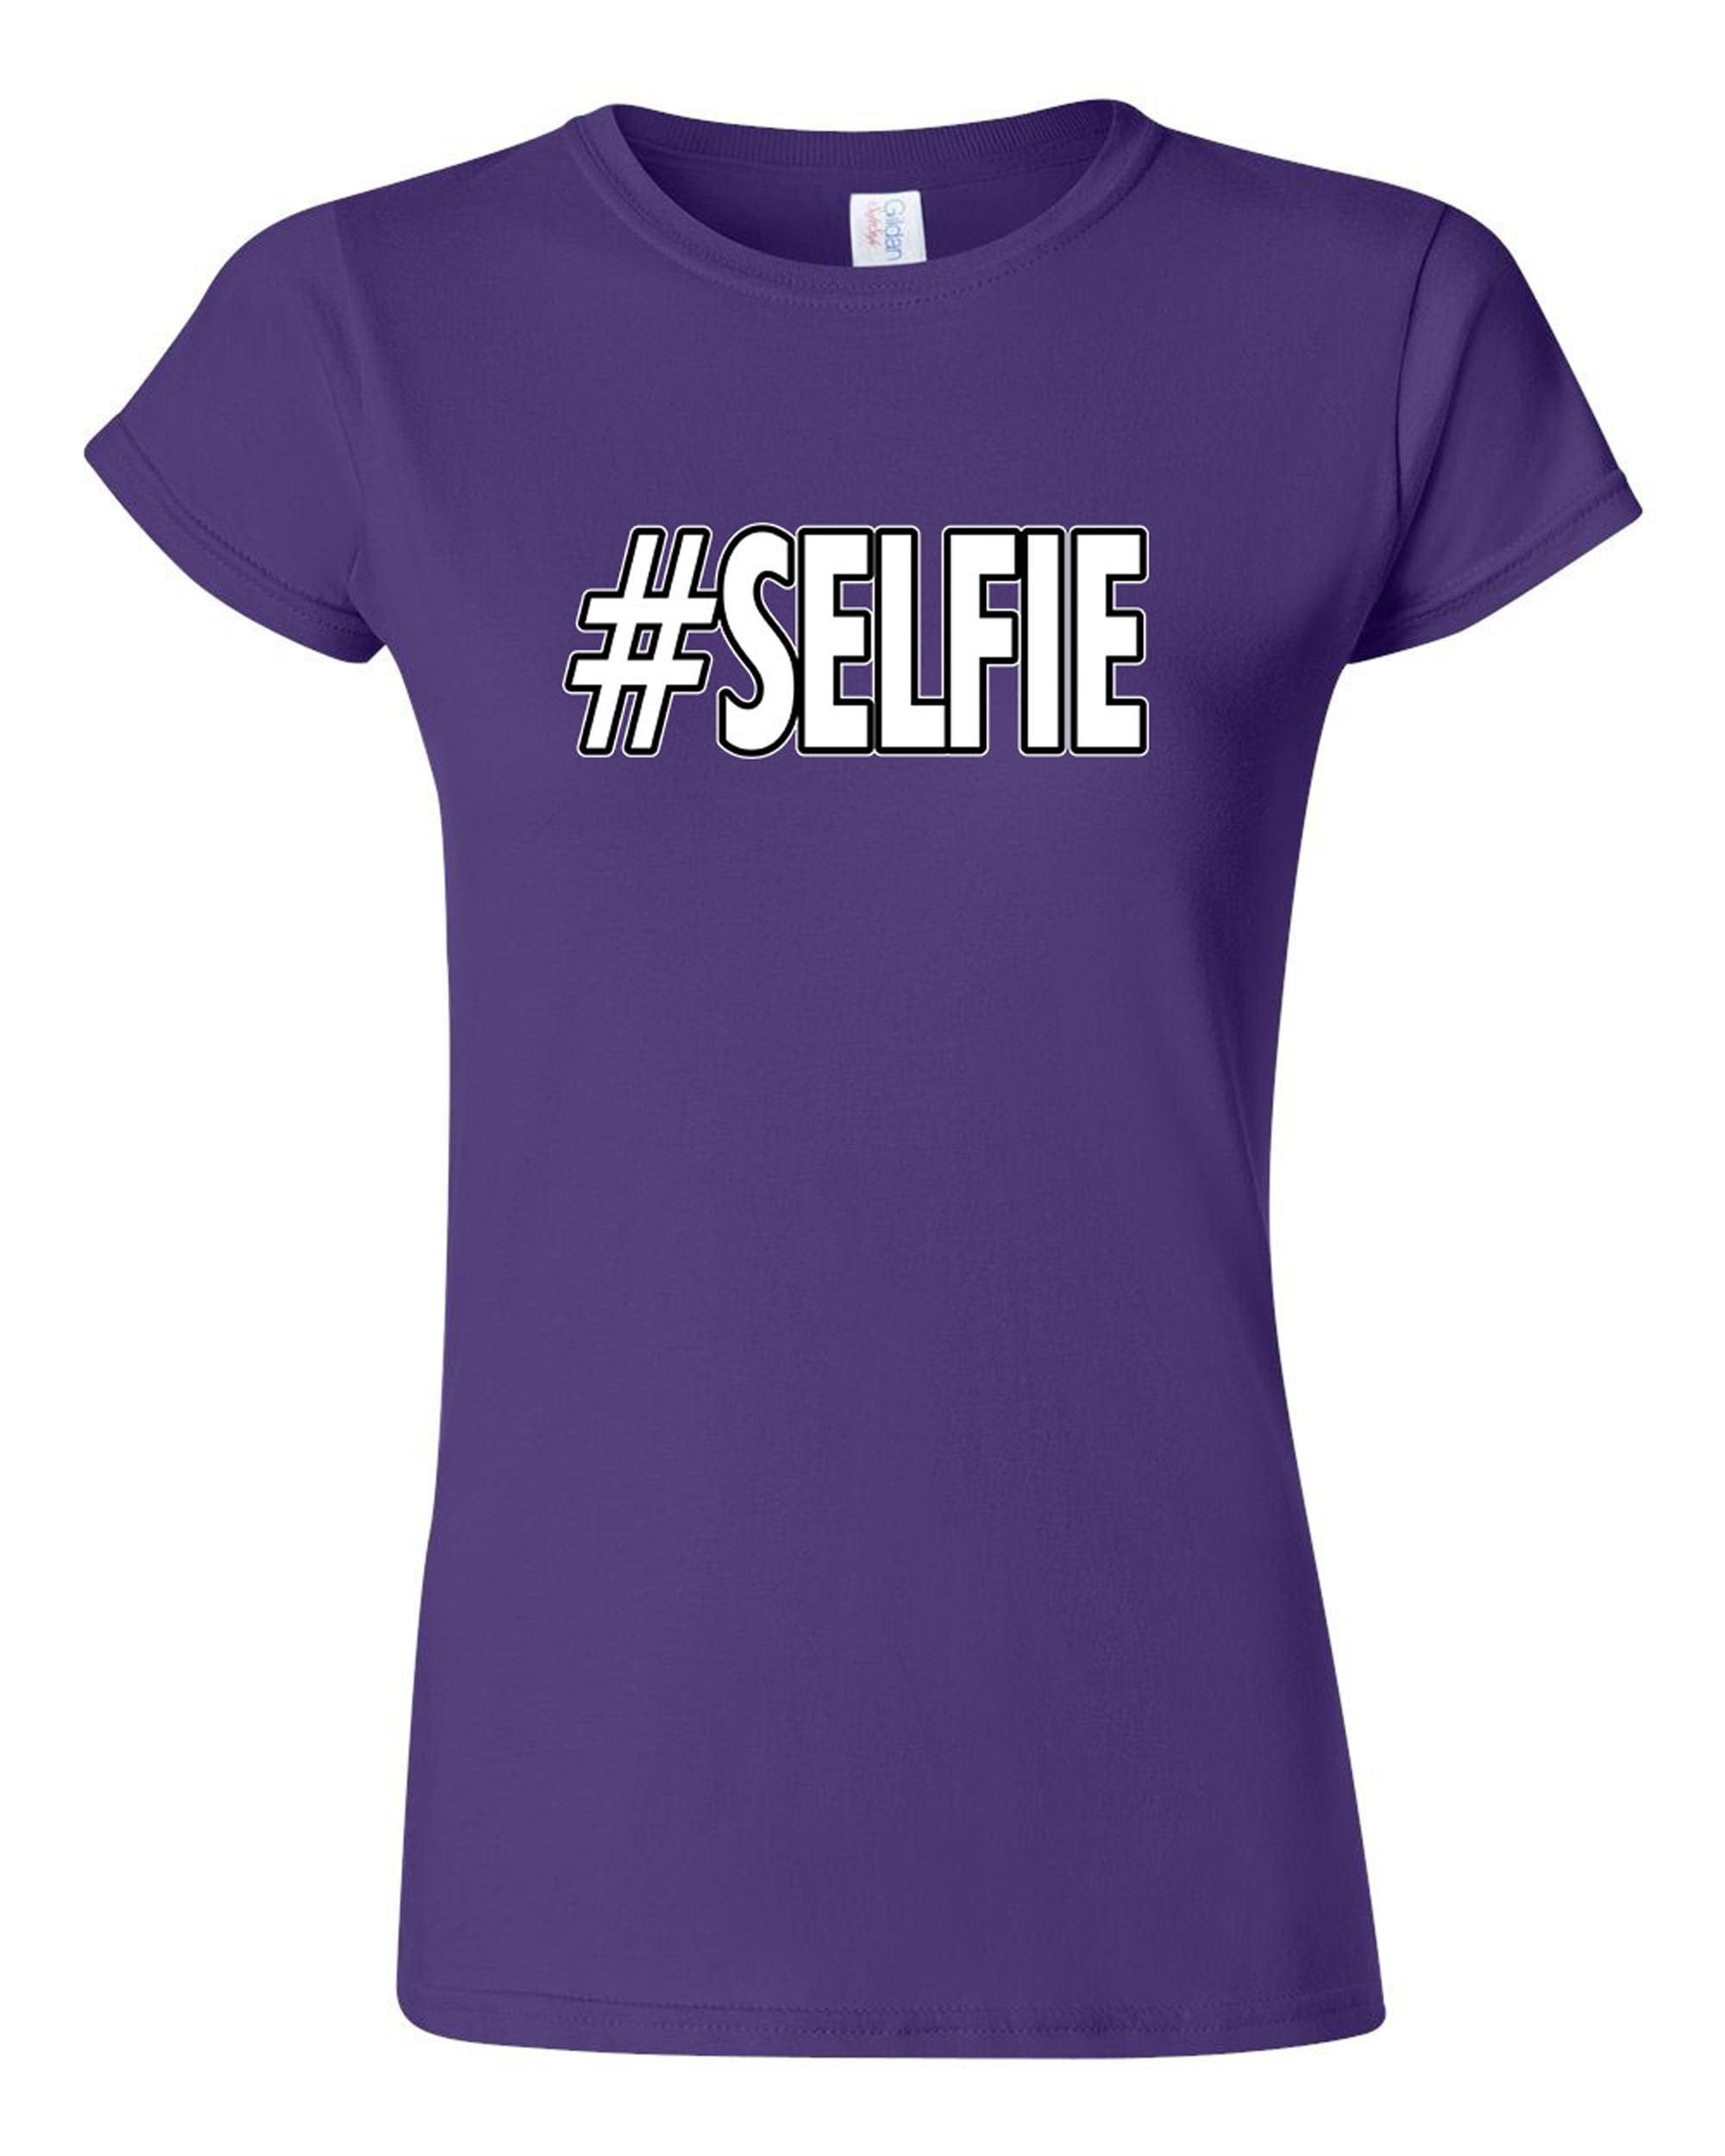 Junior Selfie Hashtag Funny Humor DT T-Shirt Tee